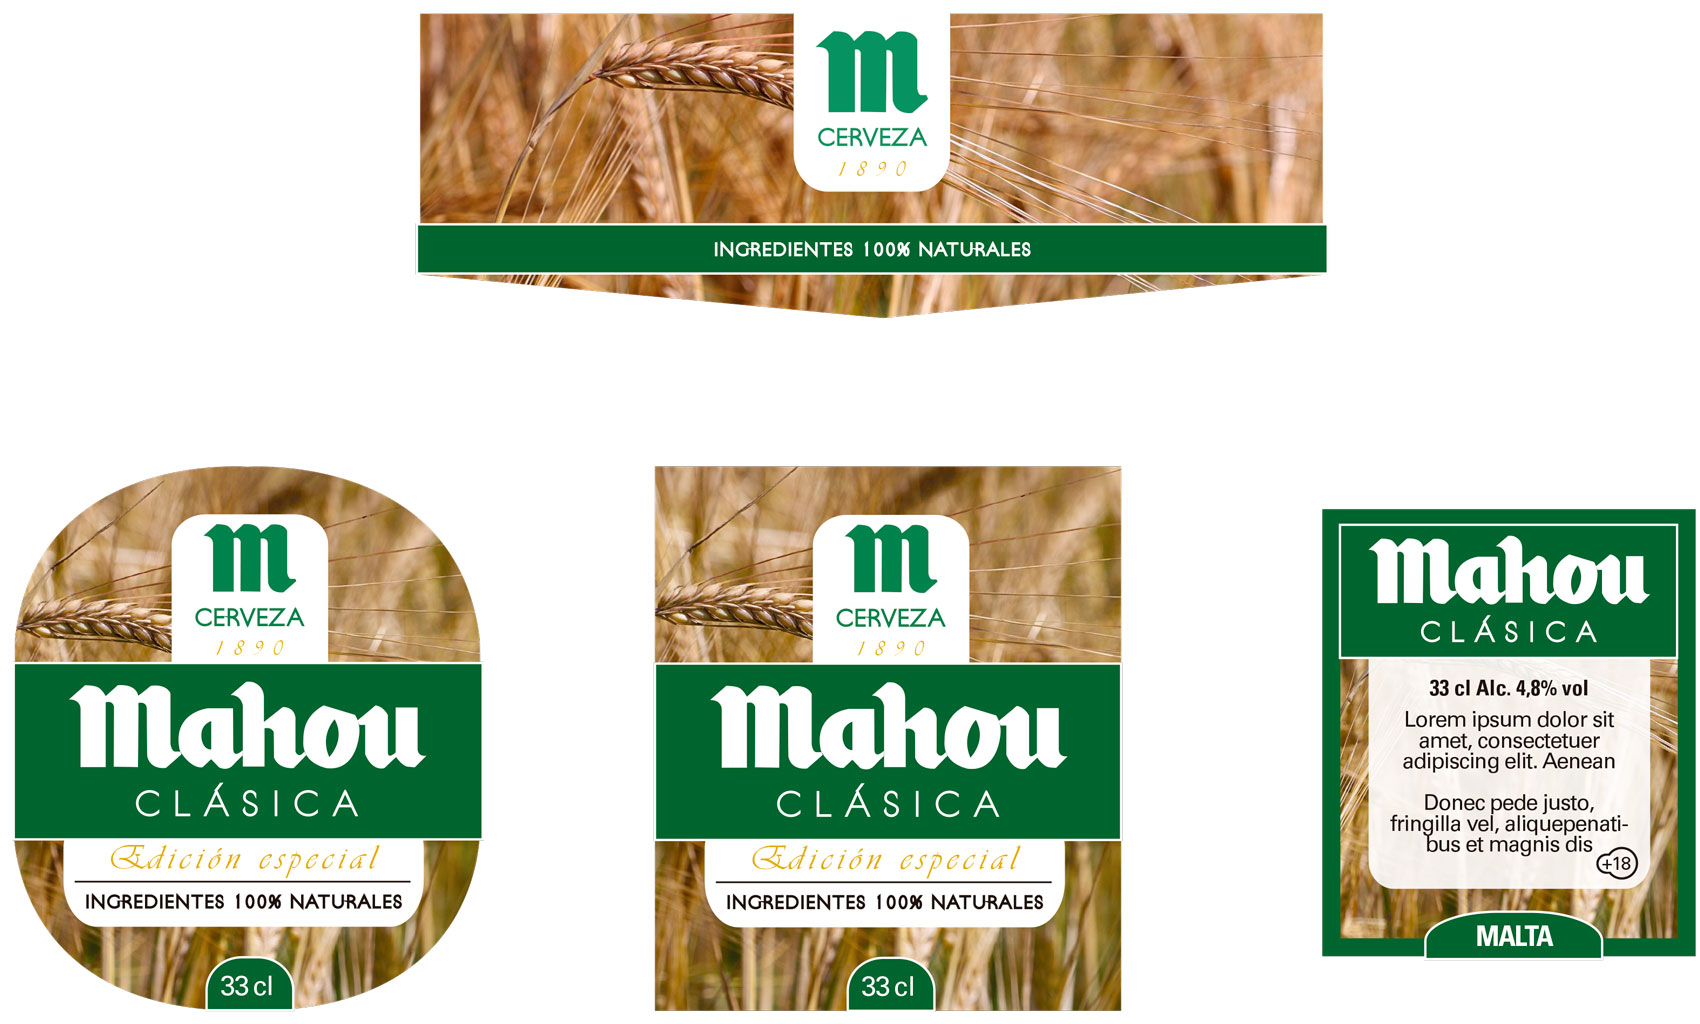 Malt labels